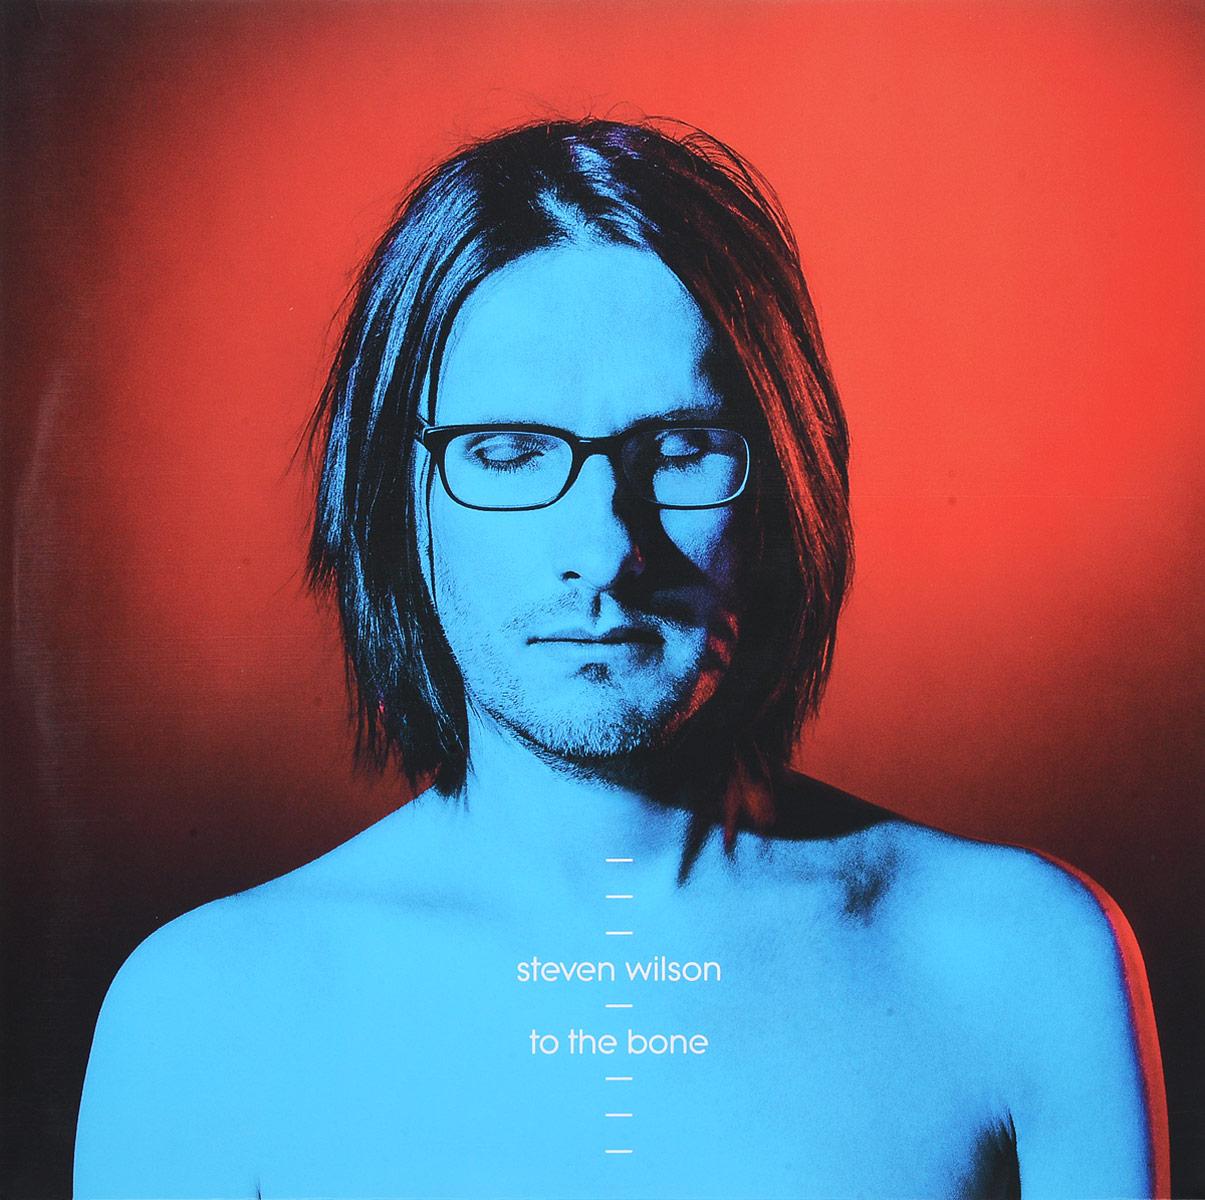 Стивен Уилсон Steven Wilson. To The Bone (2 LP) дэнис уилсон dennis wilson bambu the caribou sessions lp